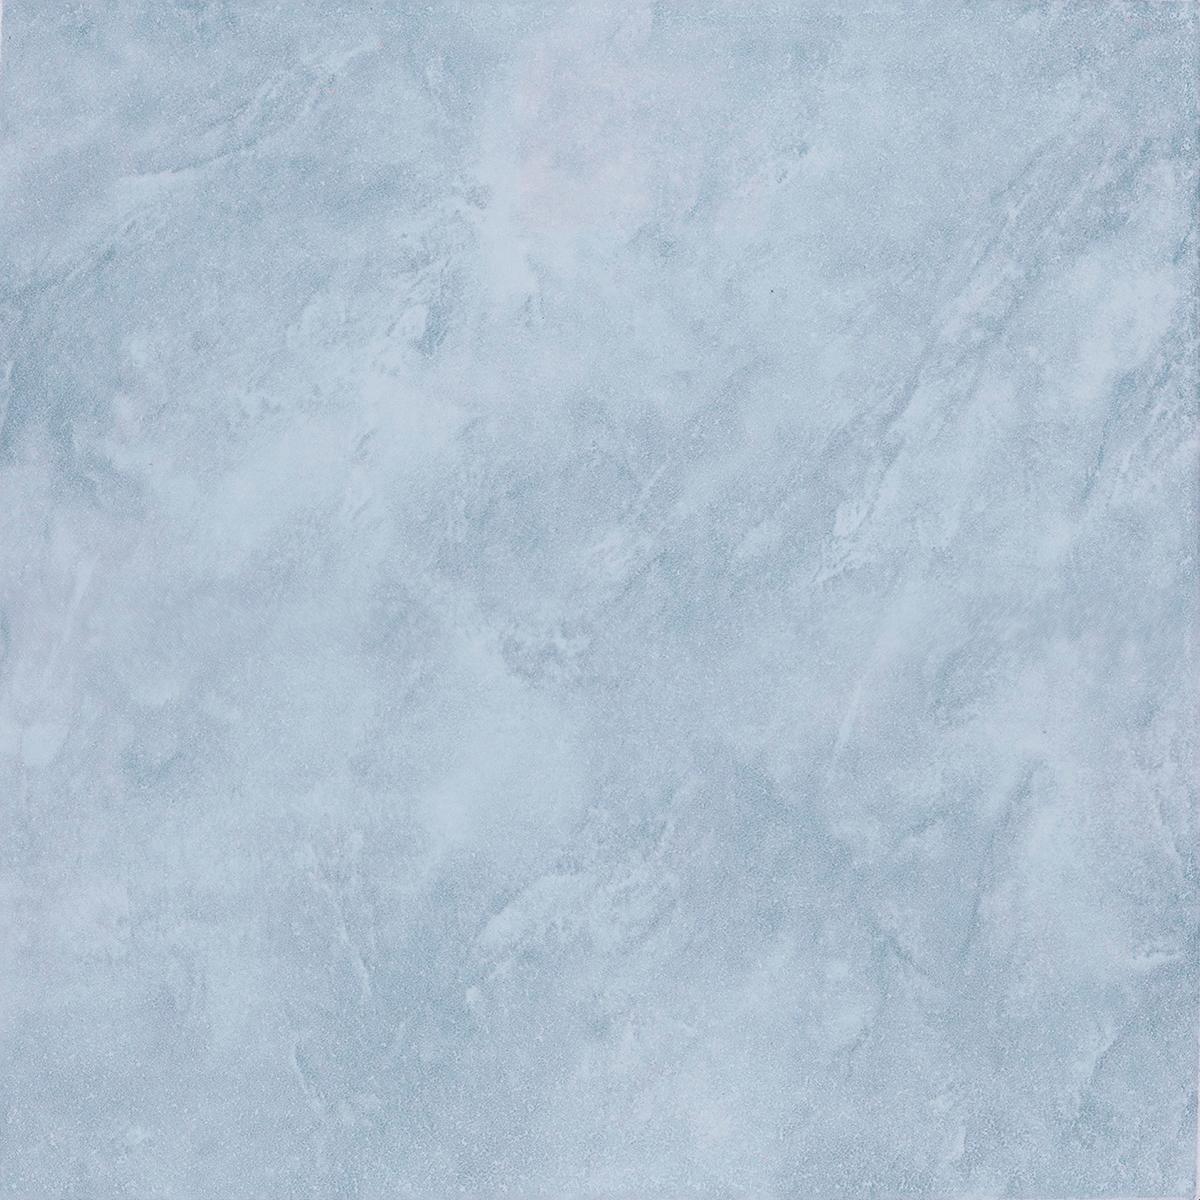 Piastrella Marmor 33 x 33 cm sp. 7.5 mm normal azzurro - 3